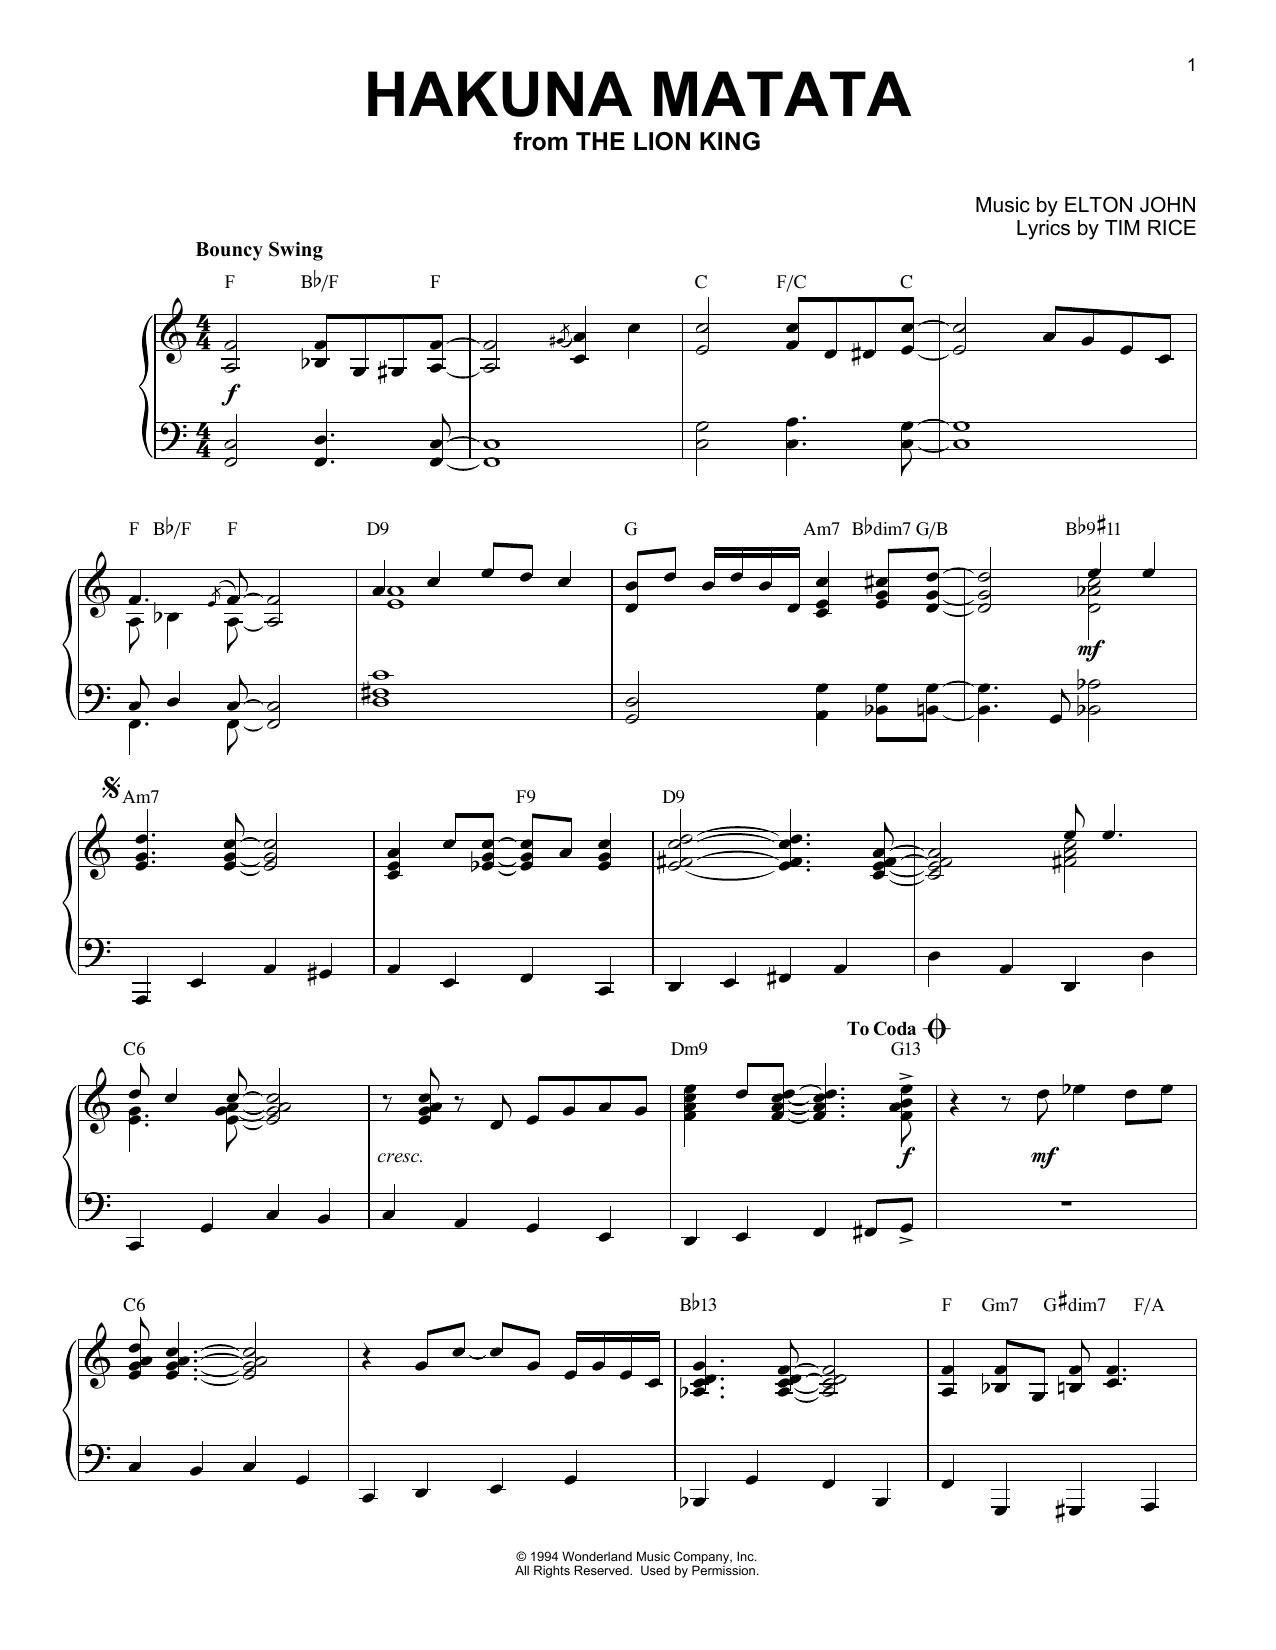 Elton John Hakuna Matata [Jazz version] (from Disney's The Lion King) sheet music notes and chords. Download Printable PDF.